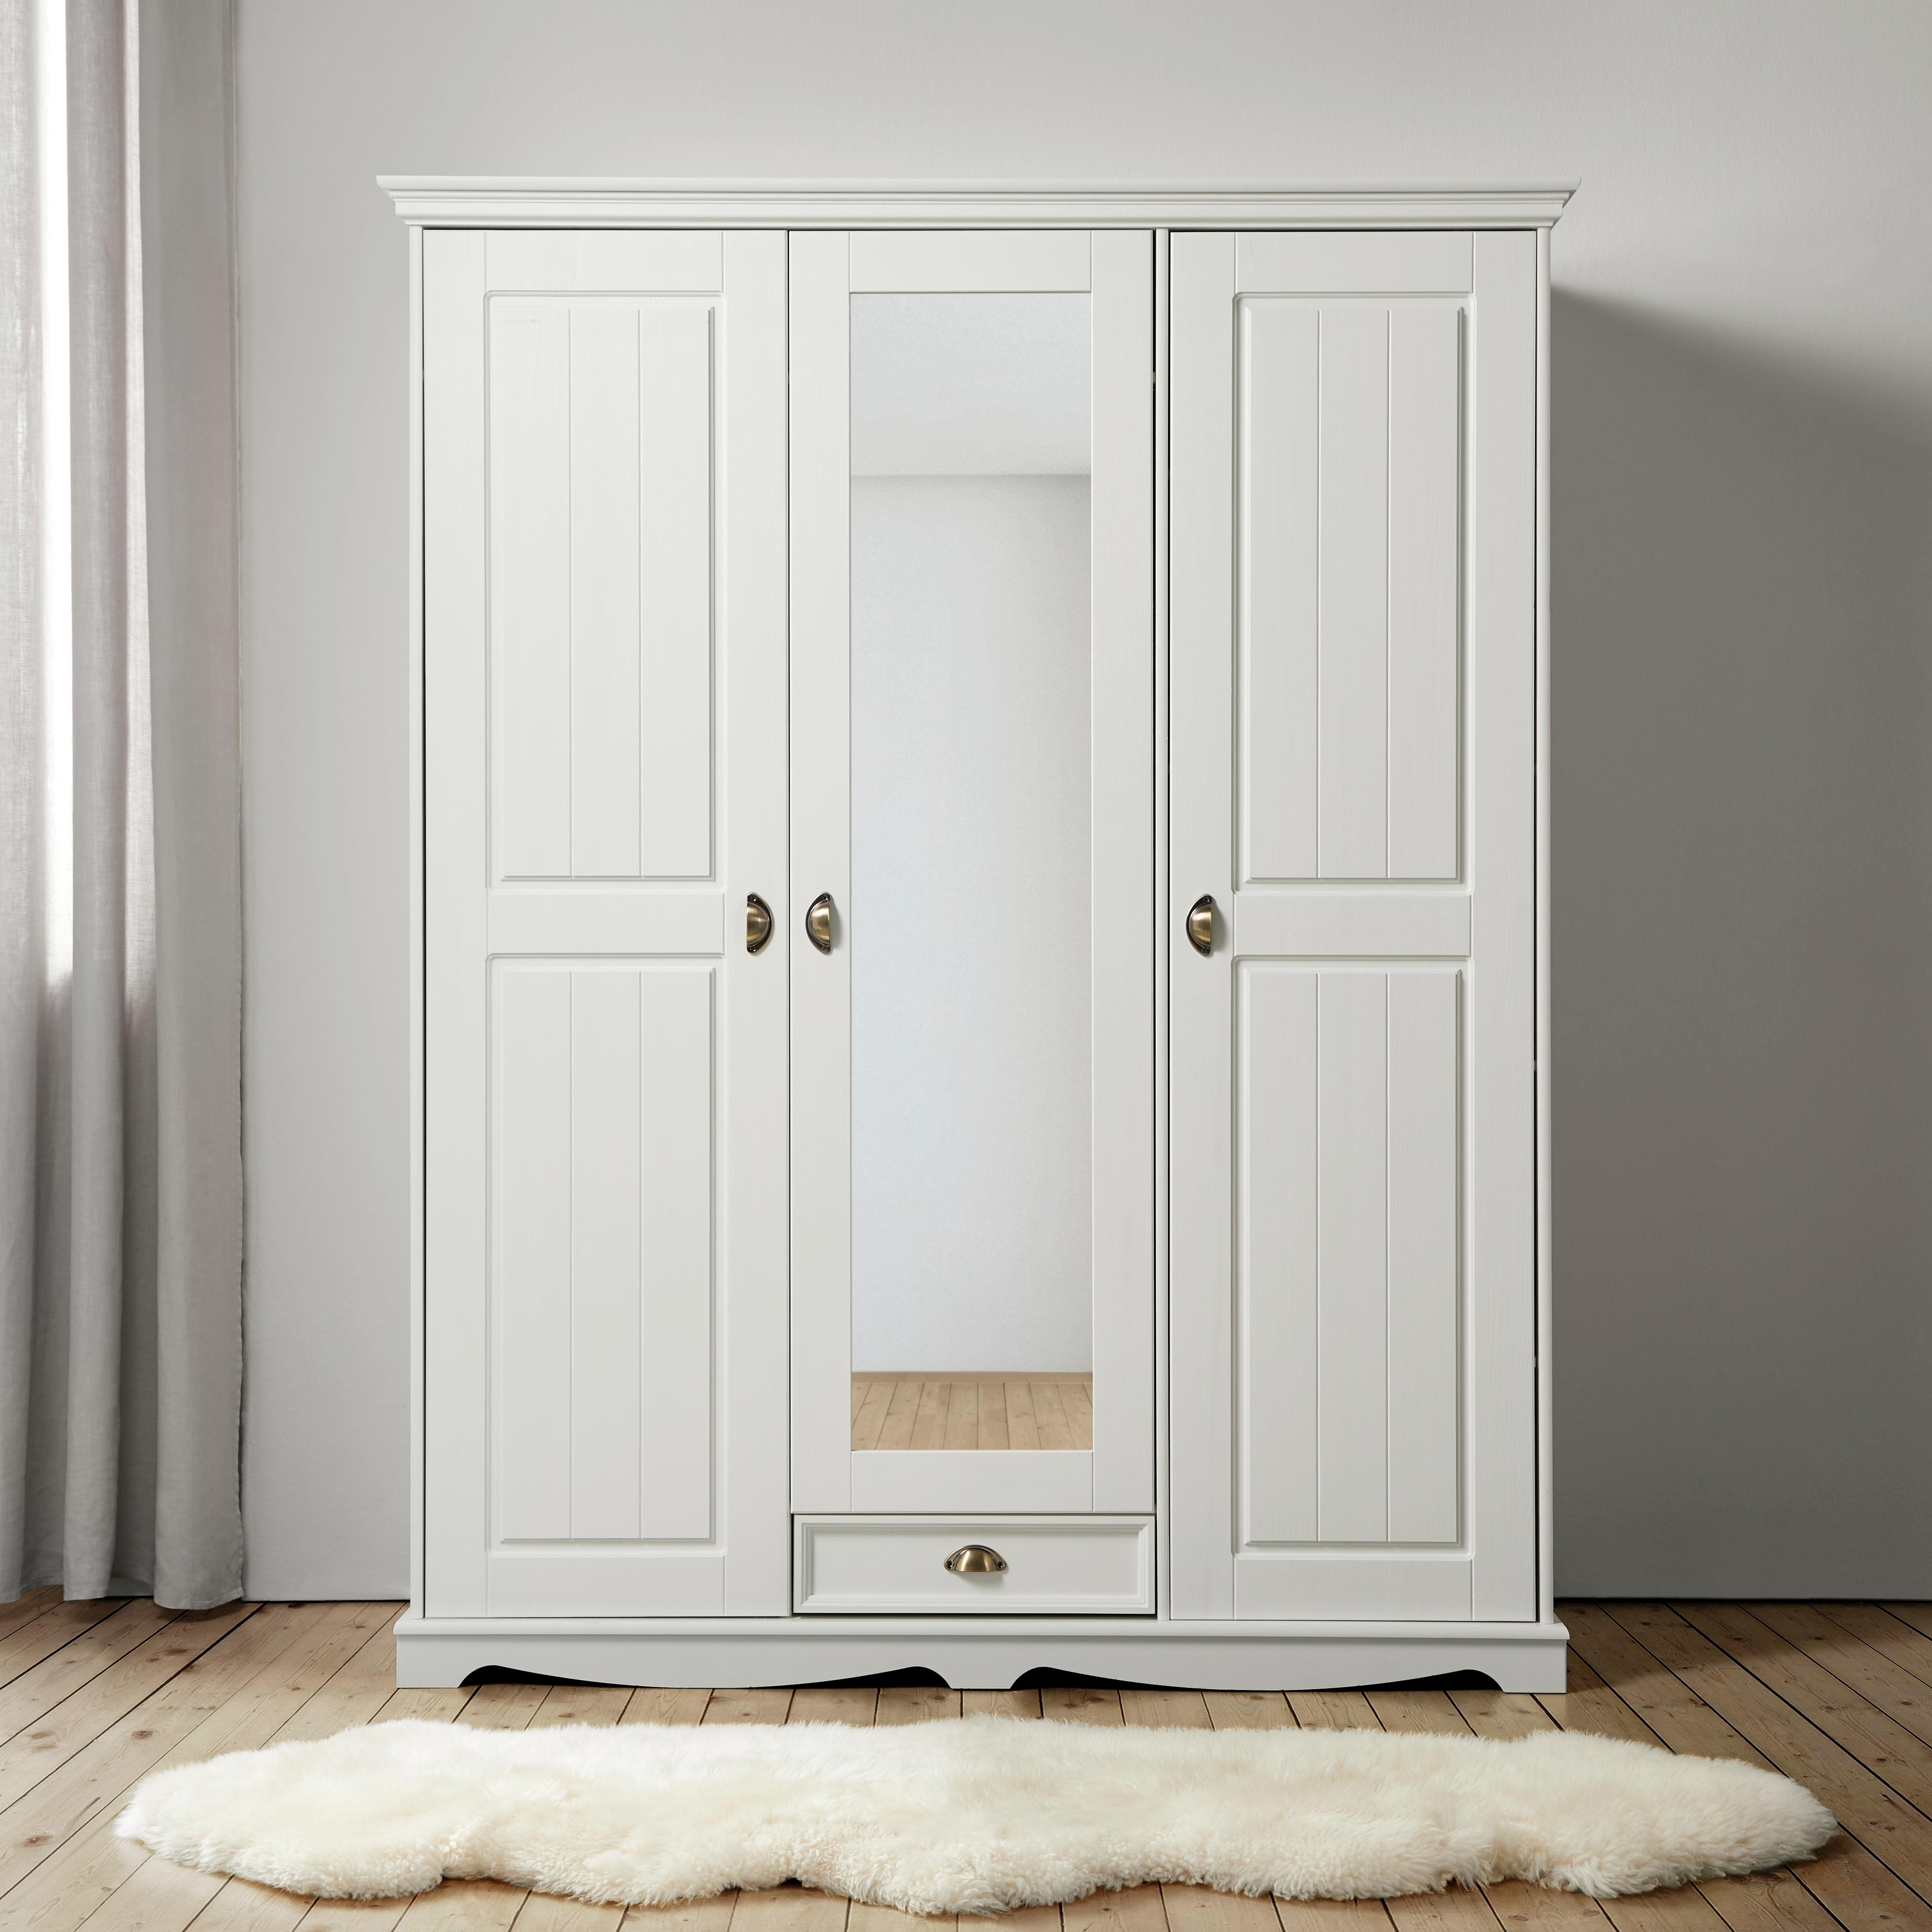 Kleiderschrank Claudia - Weiß, Holz/Metall (156/194/59,5cm) - PREMIUM LIVING